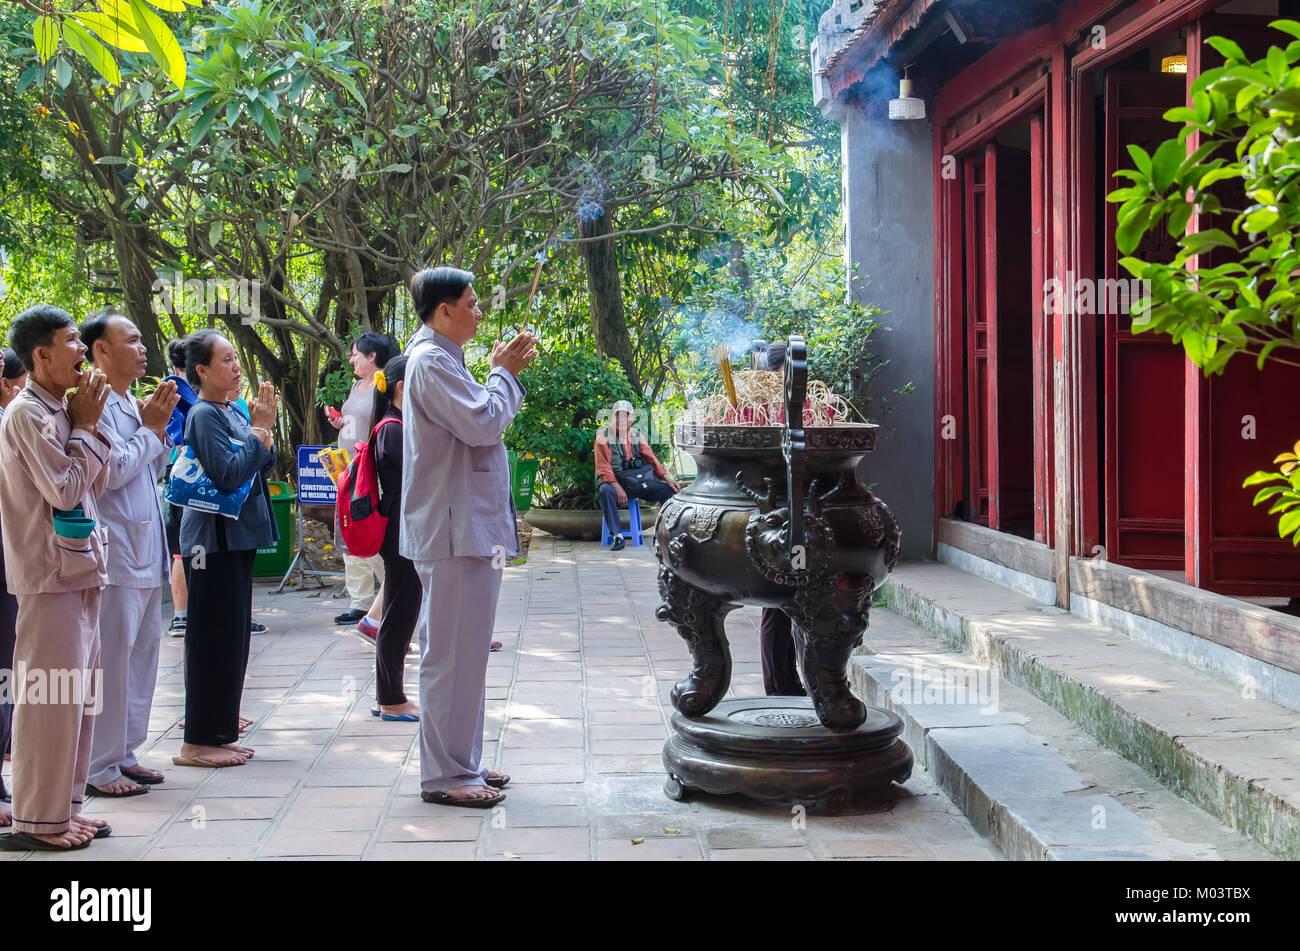 Hanoi,Vietnam - November 2,2017 : Prayers can seen praying in Ngoc Son Temple in Hanoi,Vietnam. - Stock Image